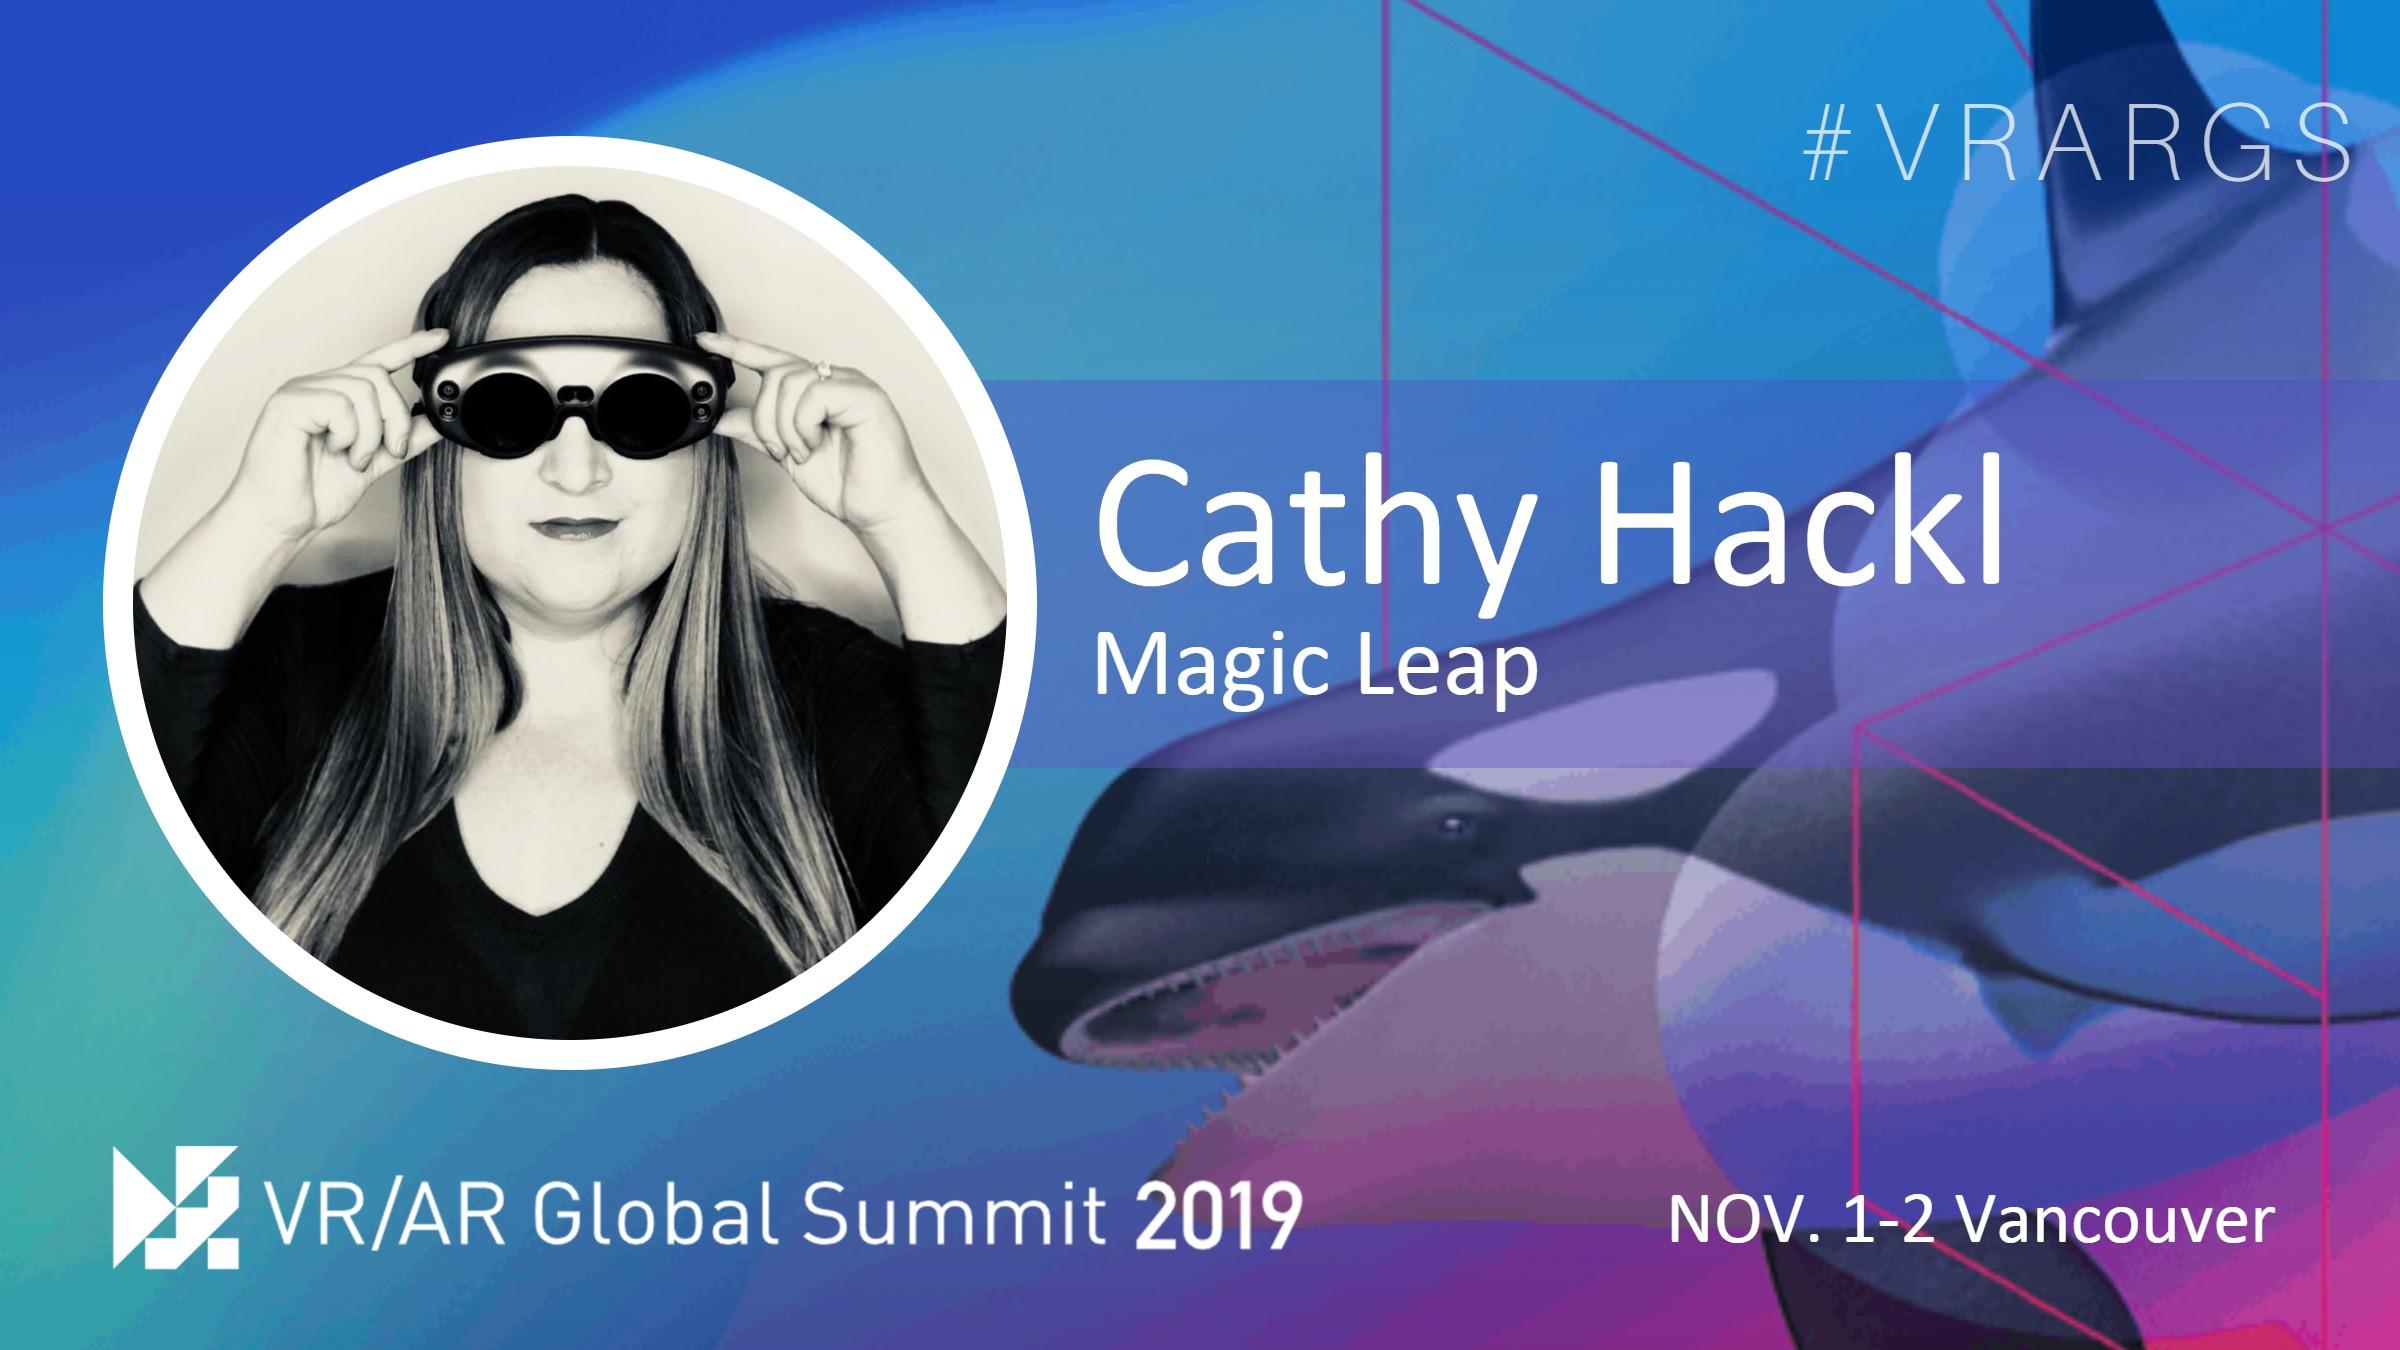 Twitter-Cathy-Hackl-Magic-Leap-VRARGS-VRAR-Global-Summit-Spatial-Computing-Vancouver.jpg